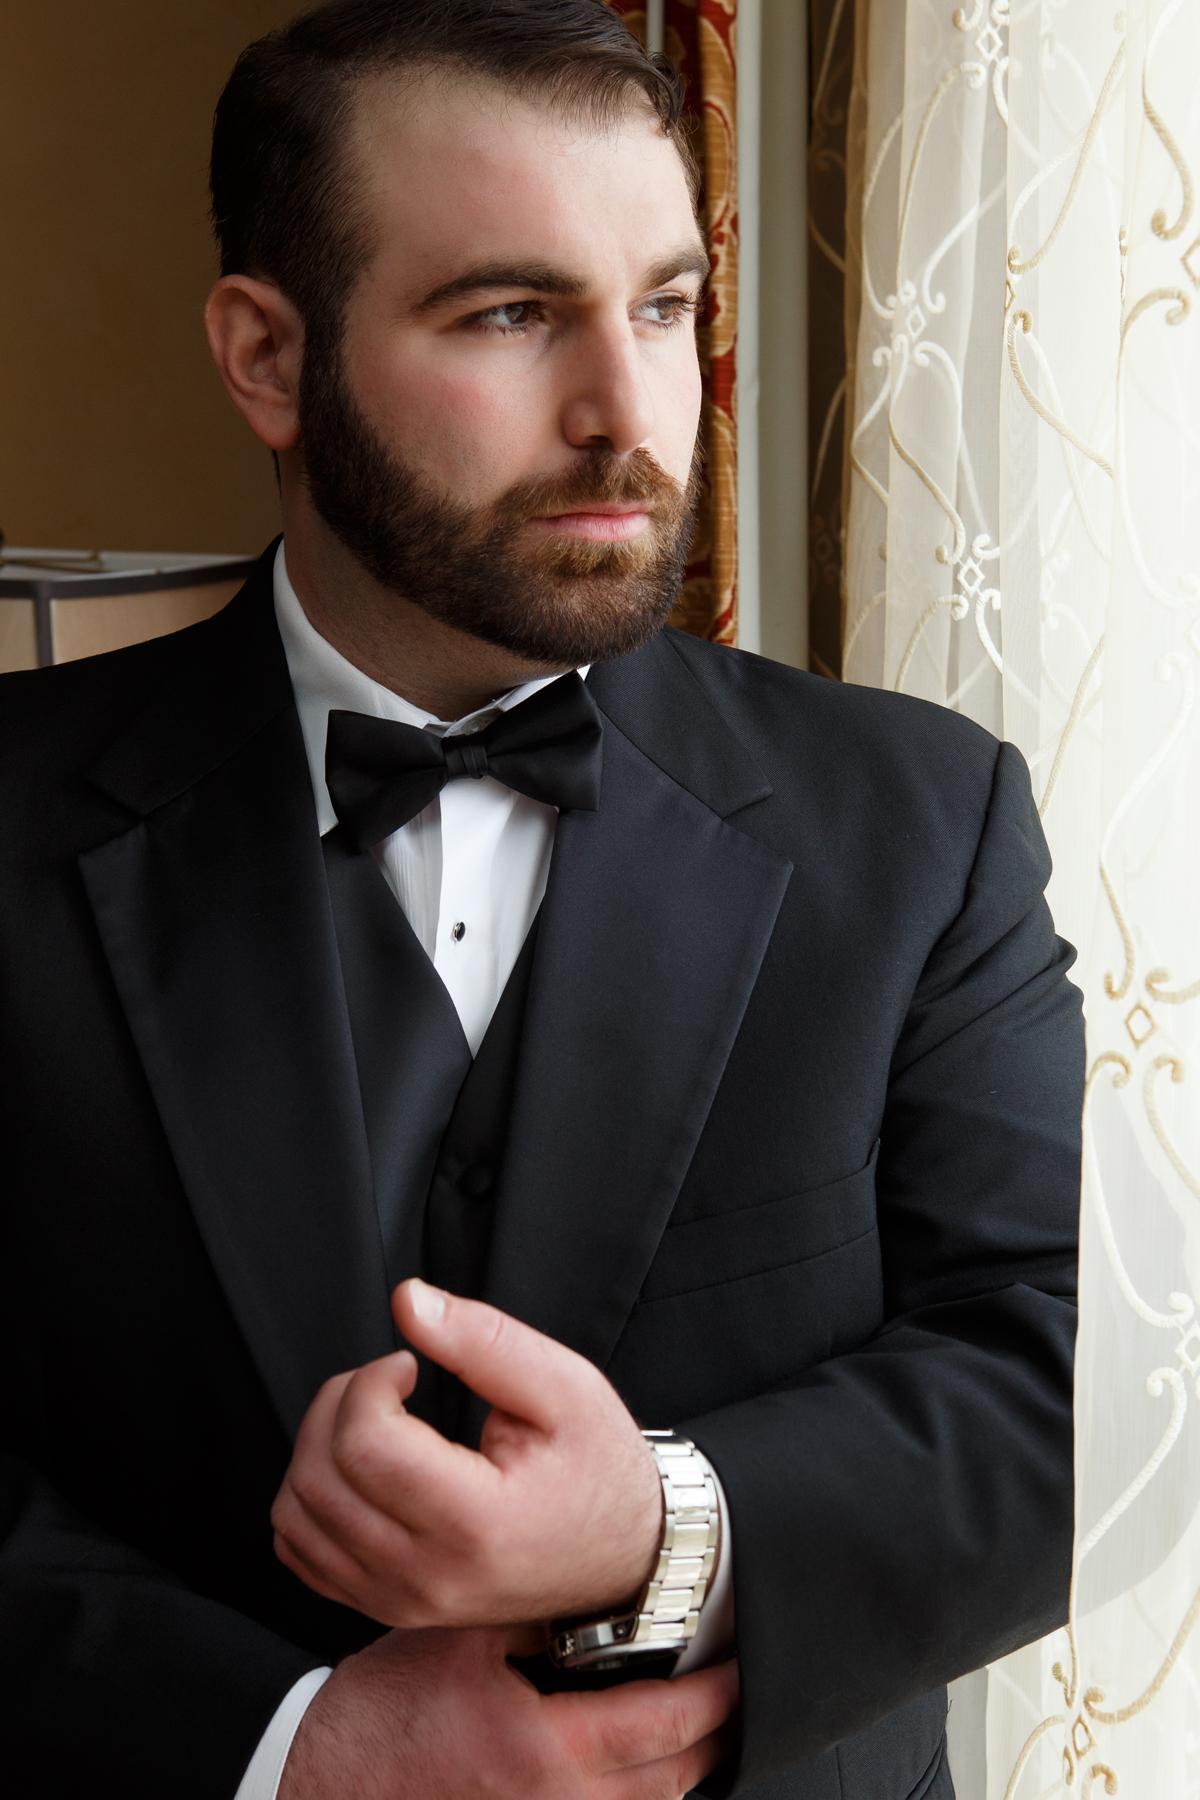 Elegant Pasadena Wedding to Make You Swoon groom looking out the window.jpg